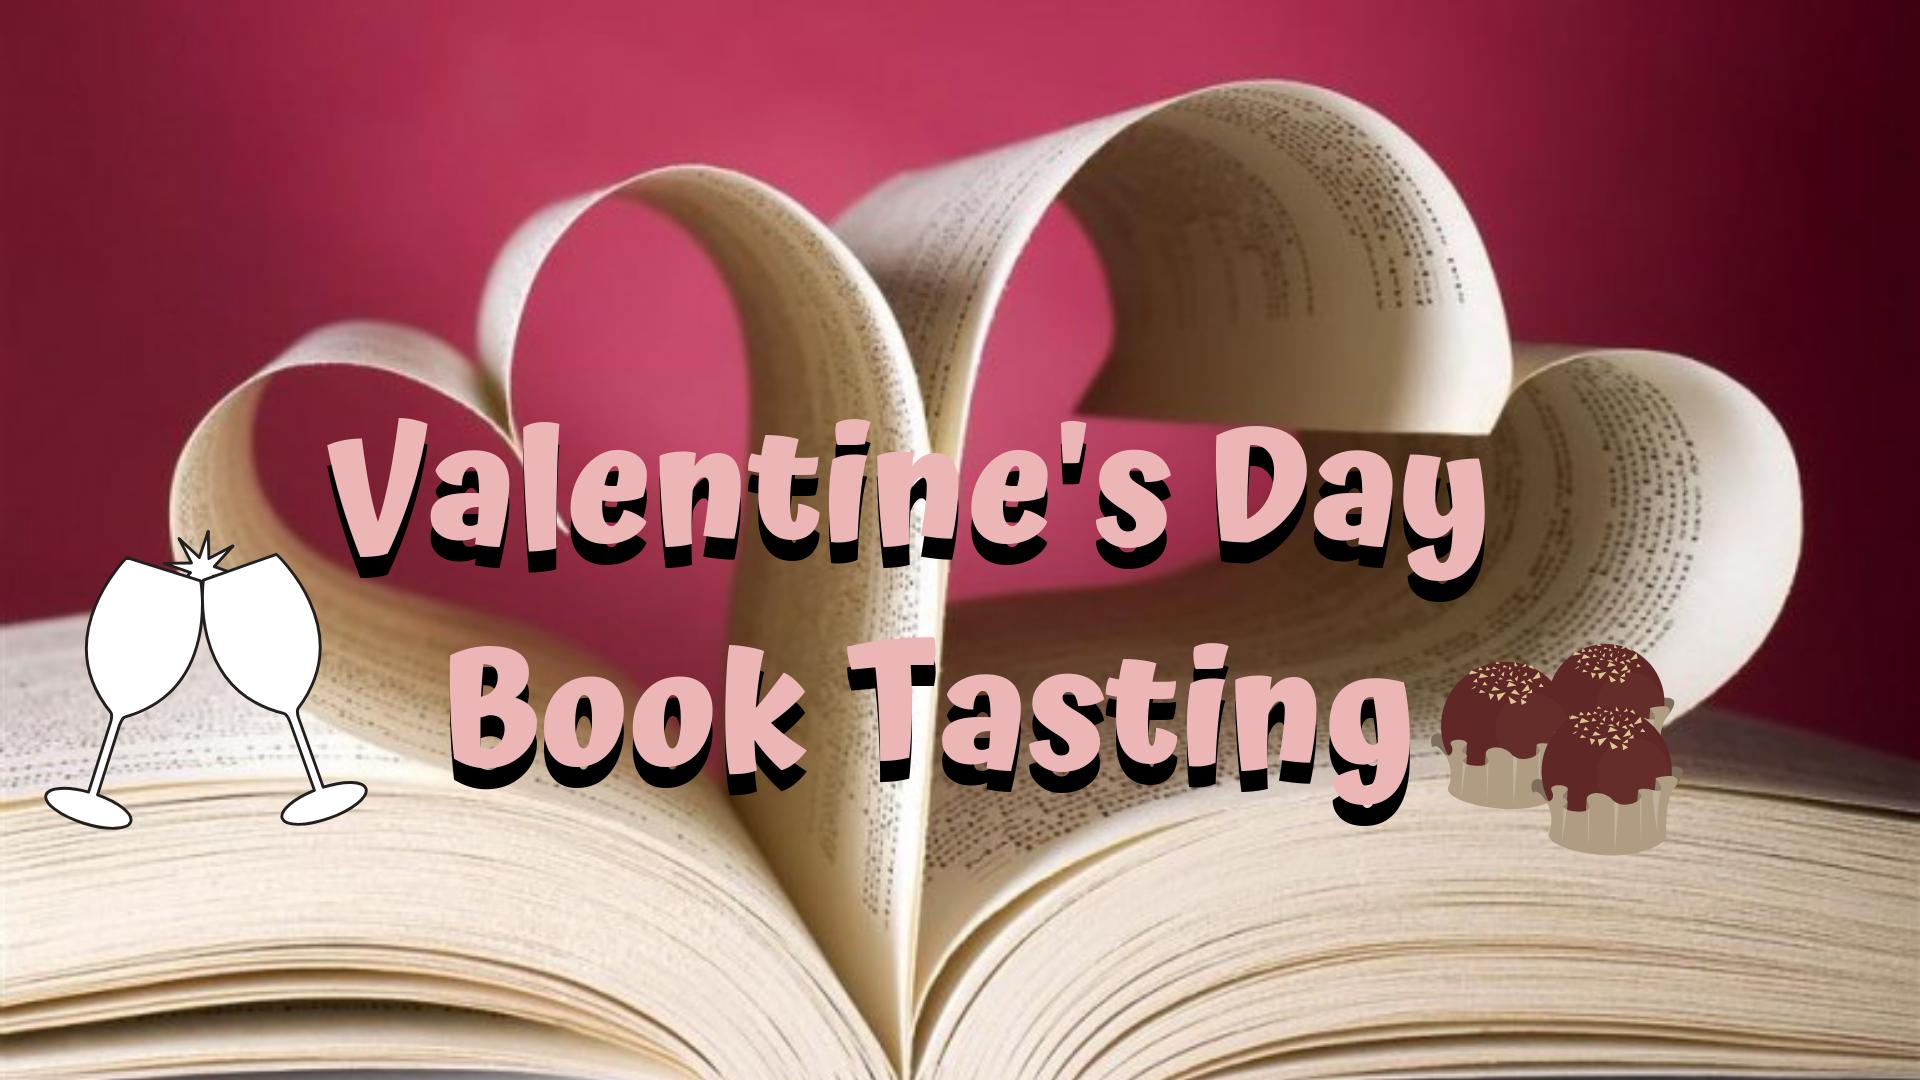 Valentine's Day Book Tasting